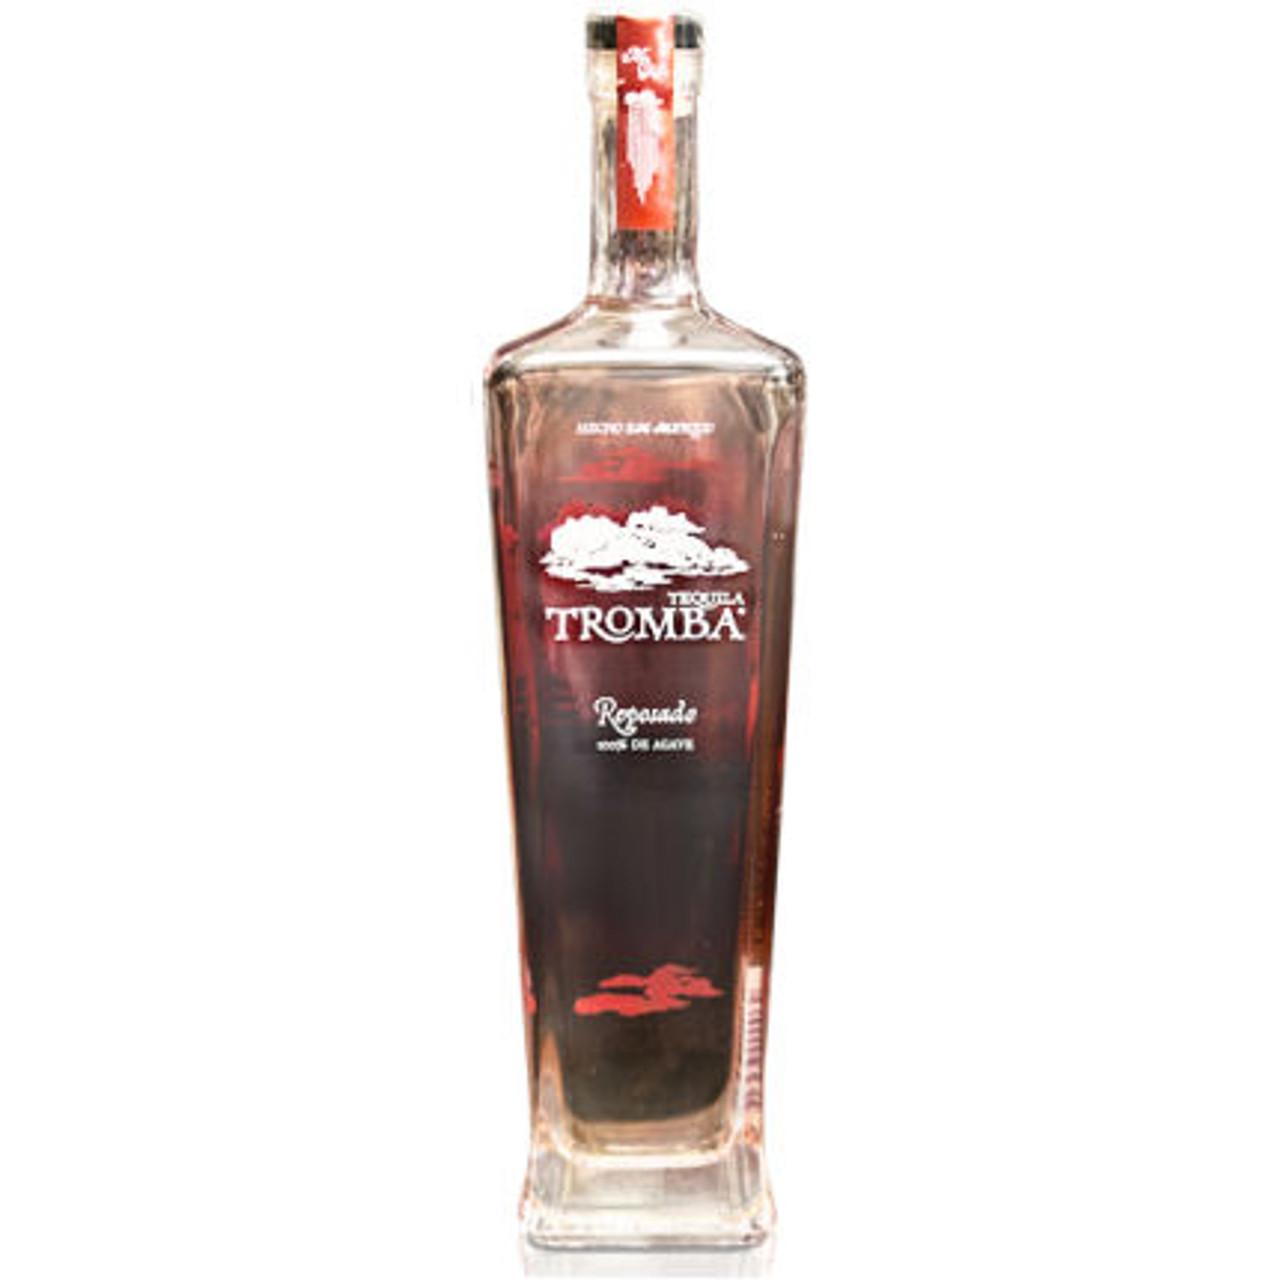 Tromba Reposado Tequila 750ml